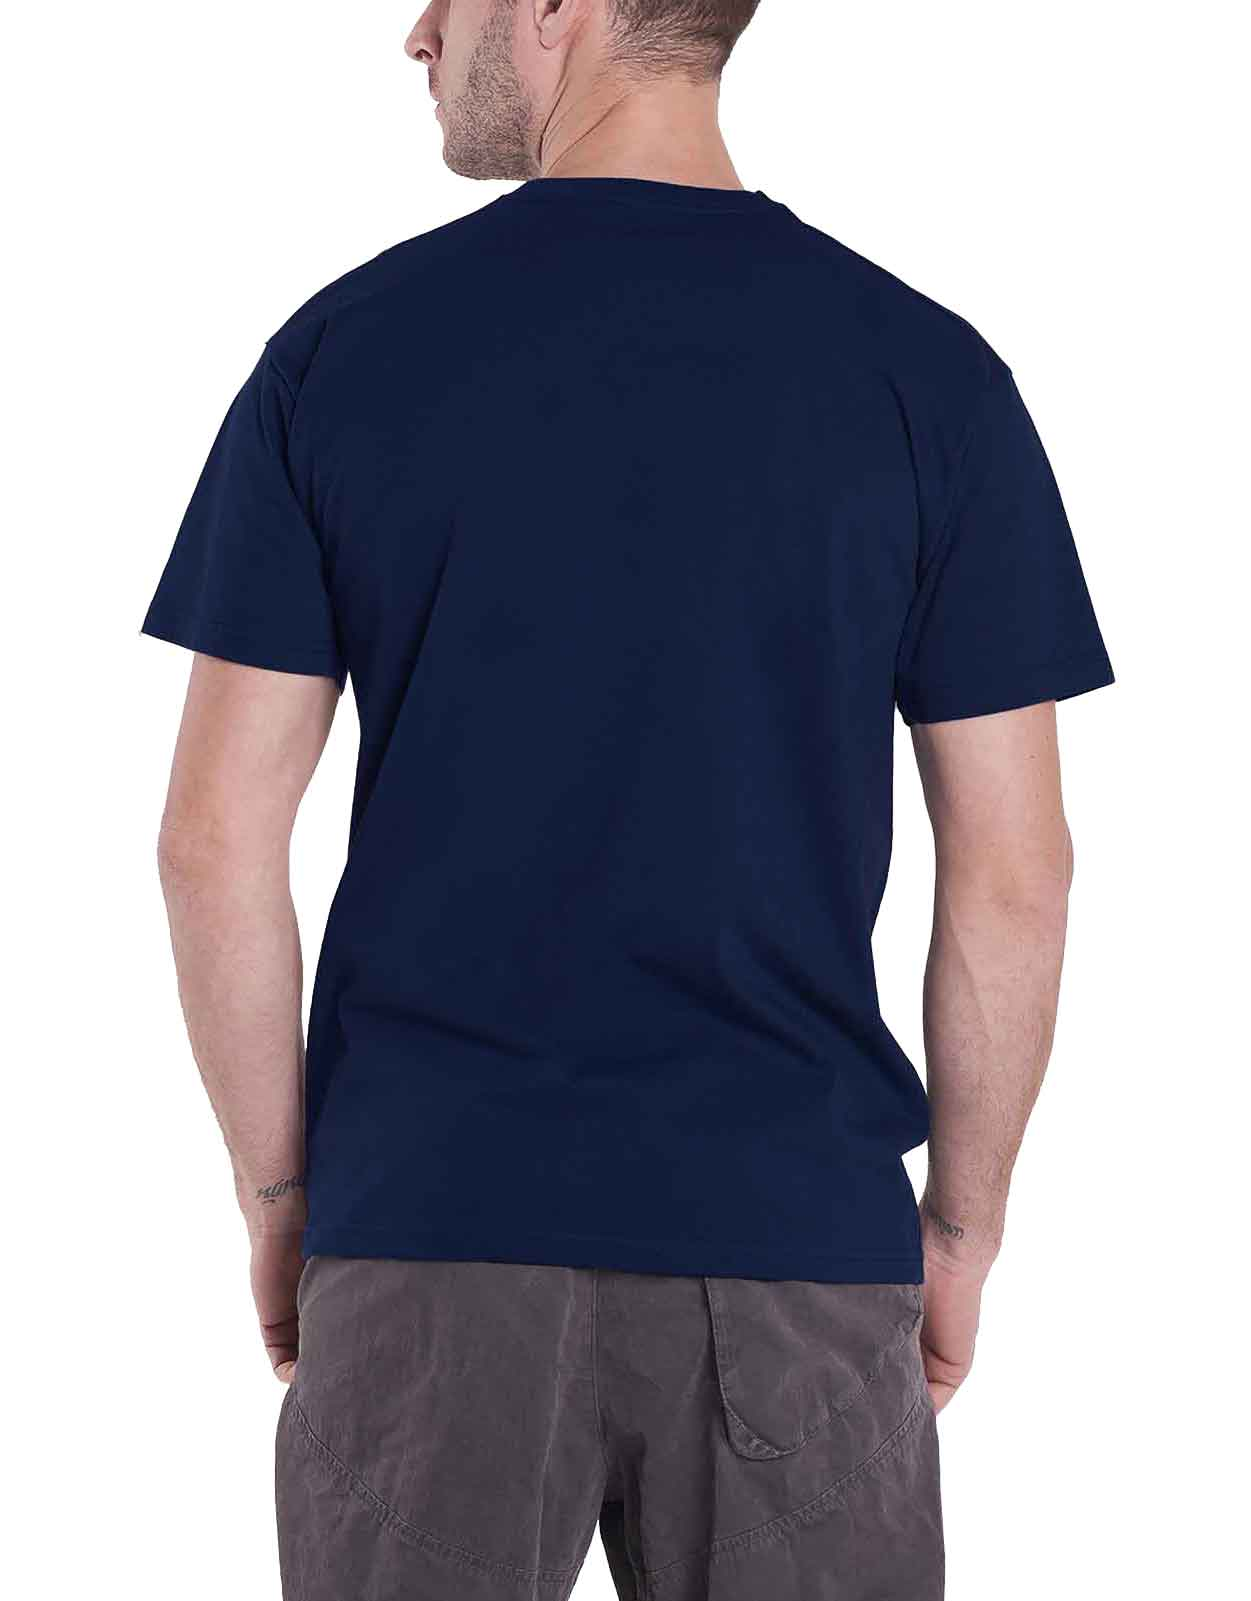 Officiel-Jimi-Hendrix-T-Shirt-Purple-Haze-Are-you-experienced-Logo-Homme-NEUF miniature 17